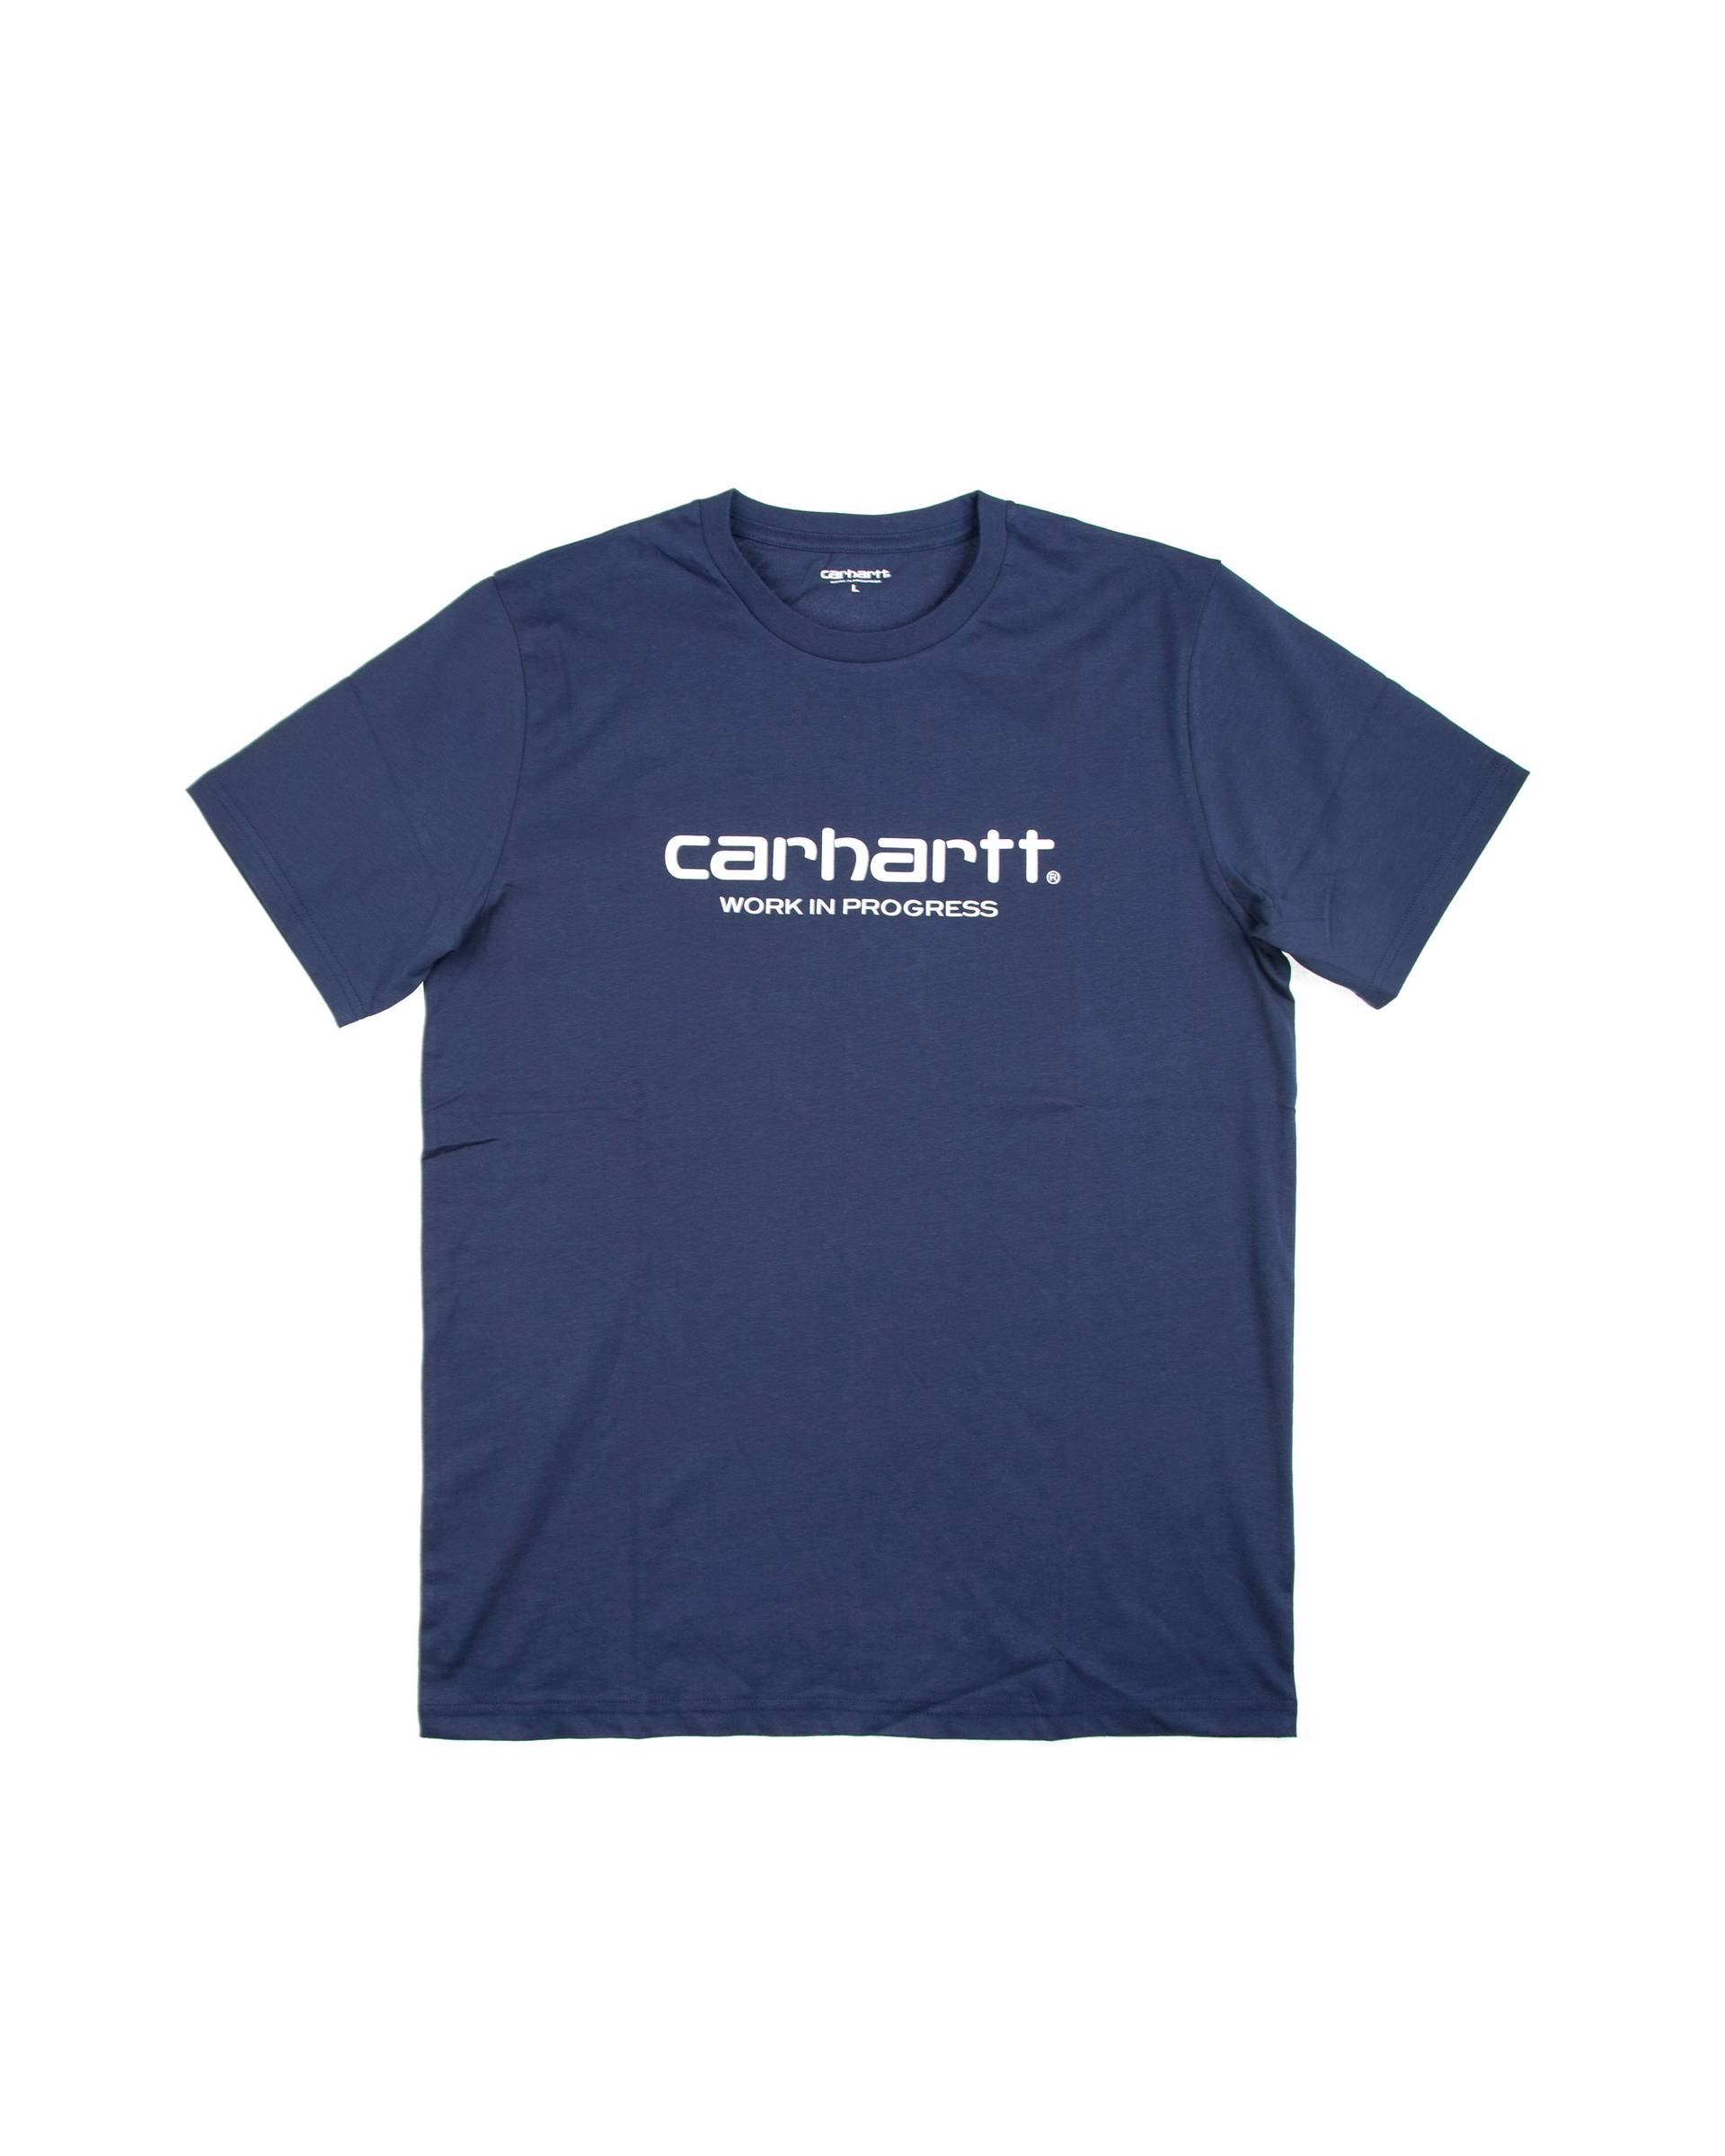 Футболка Carhartt Logo Navy